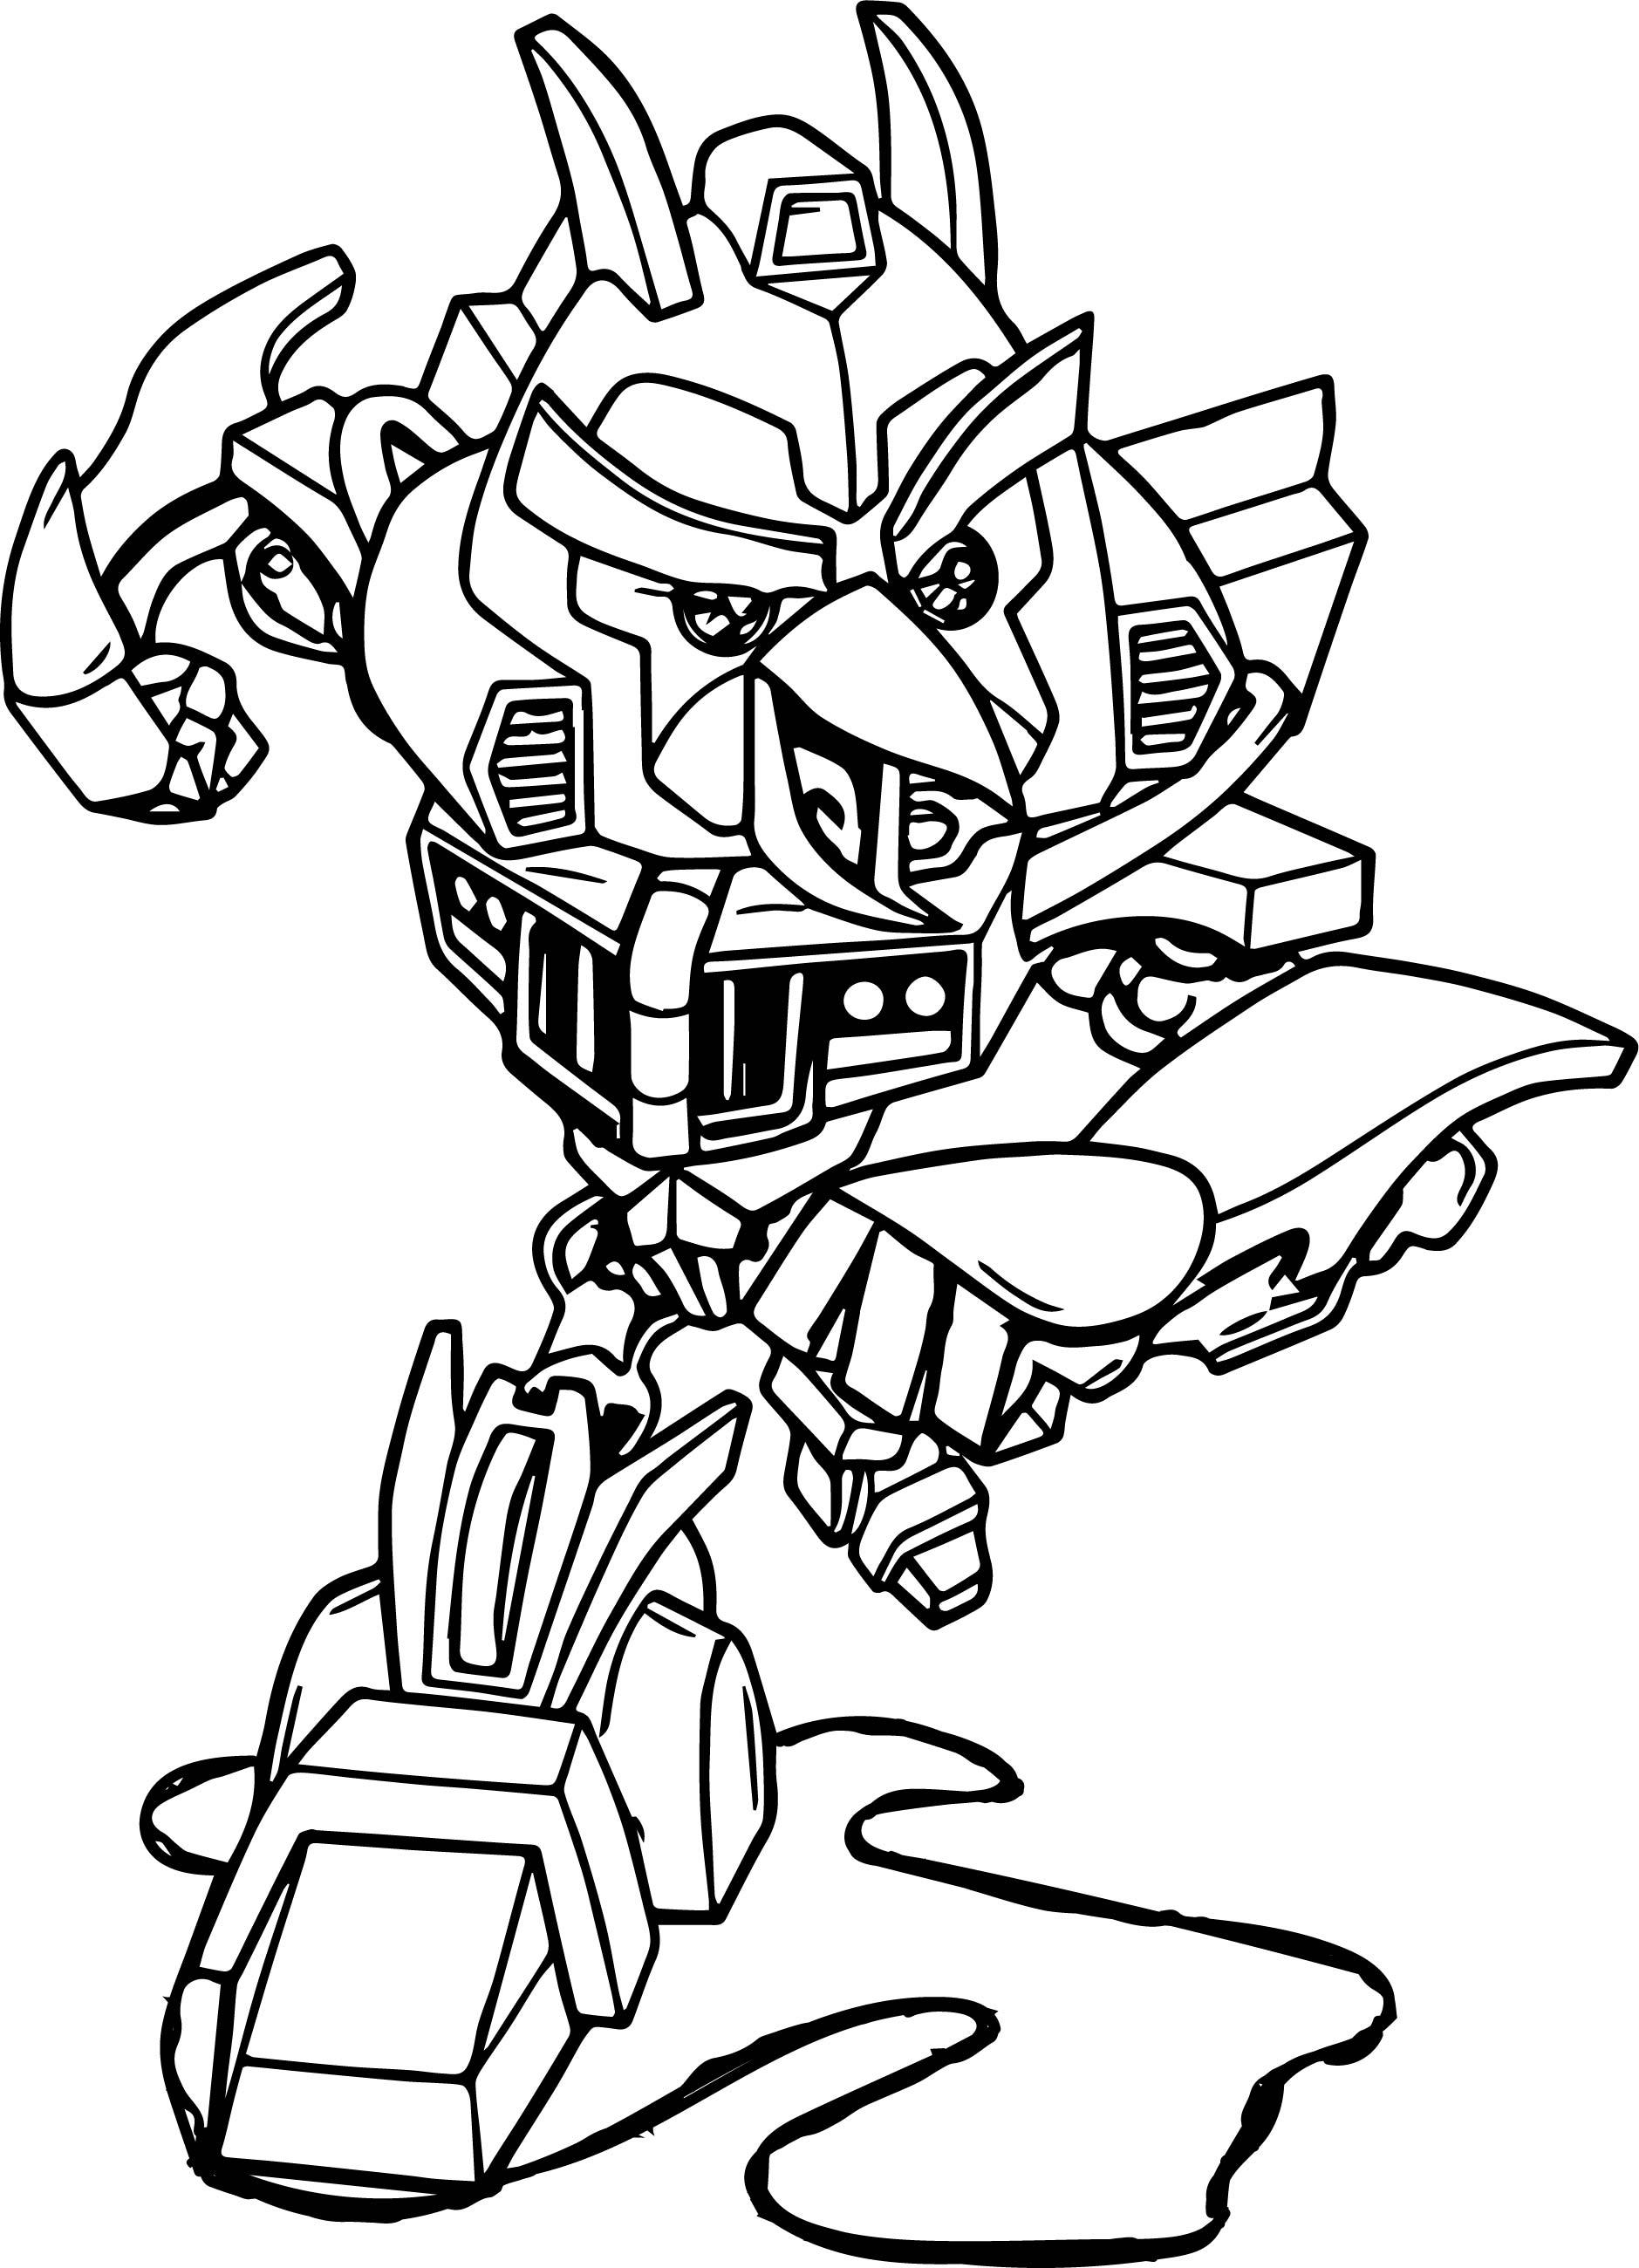 Bumblebee Line Drawing At Getdrawings